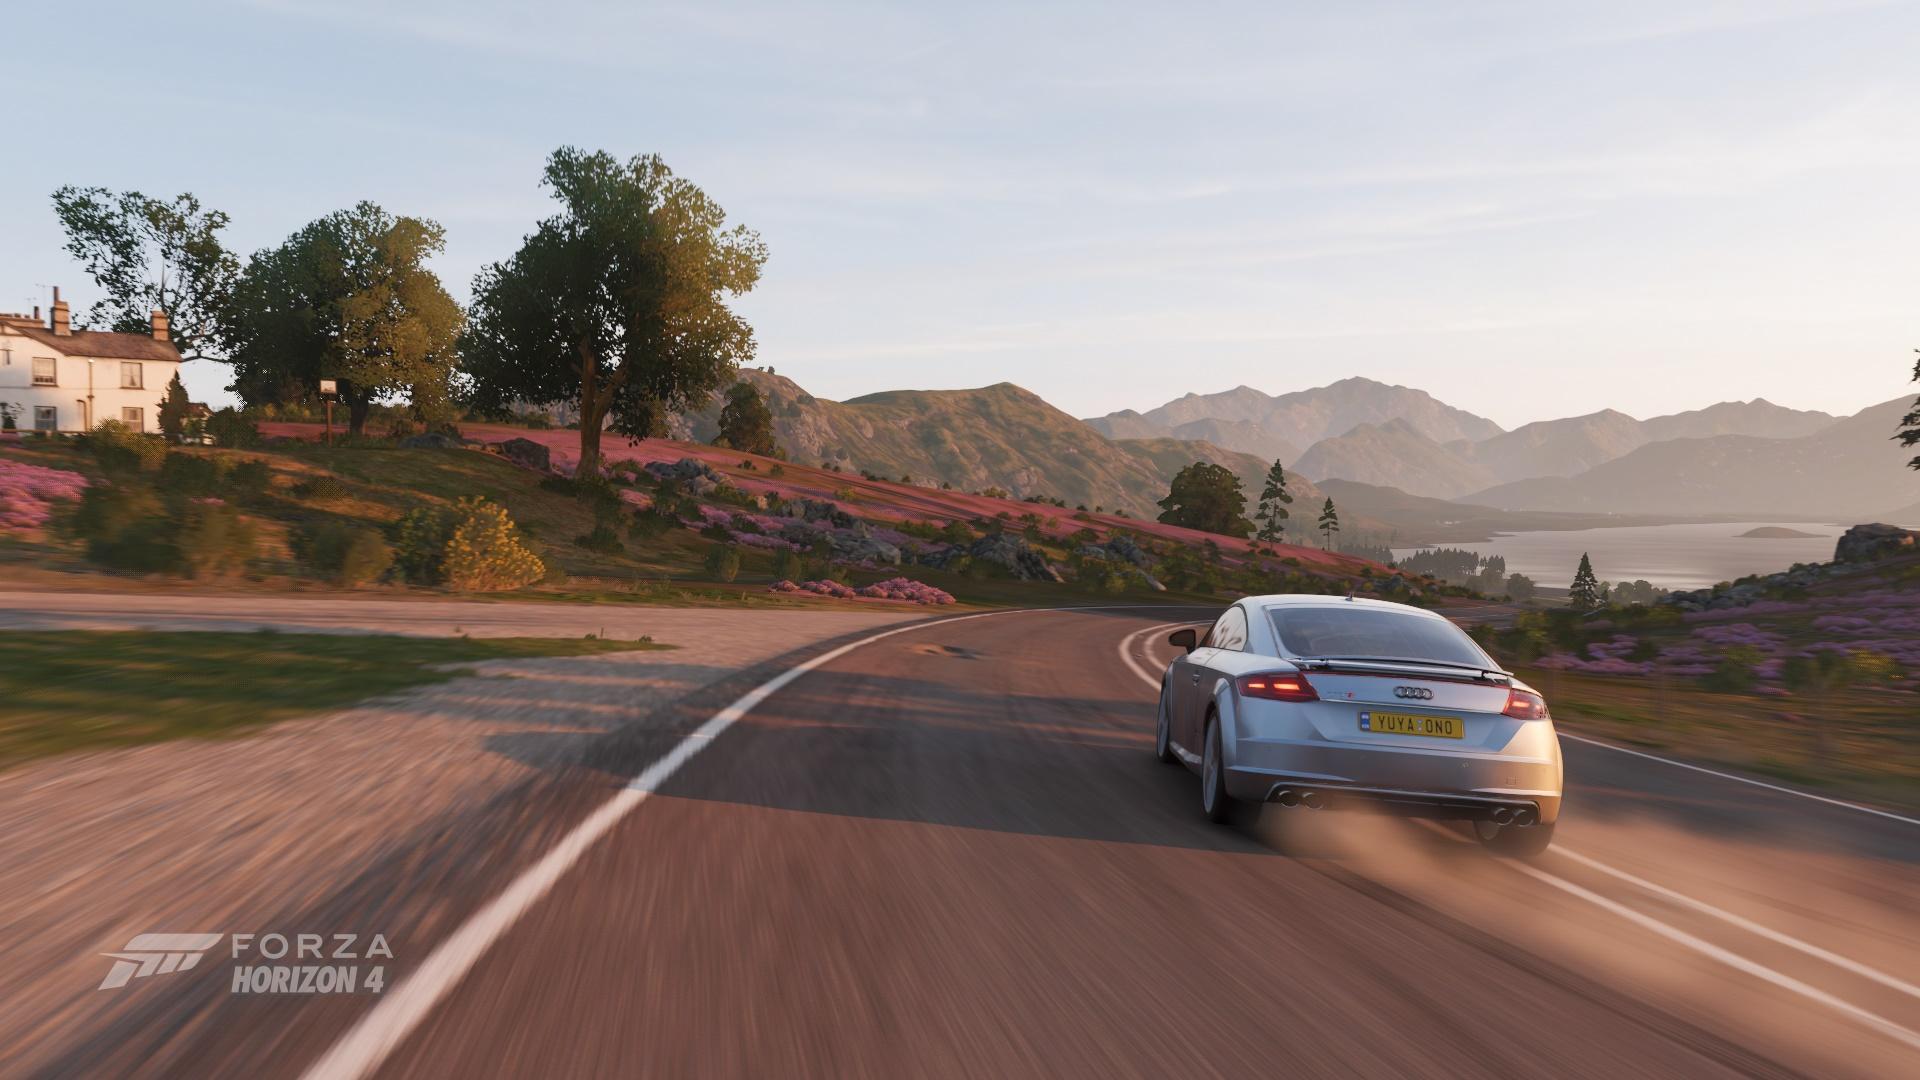 Forza Horizon 4朝のドライブ